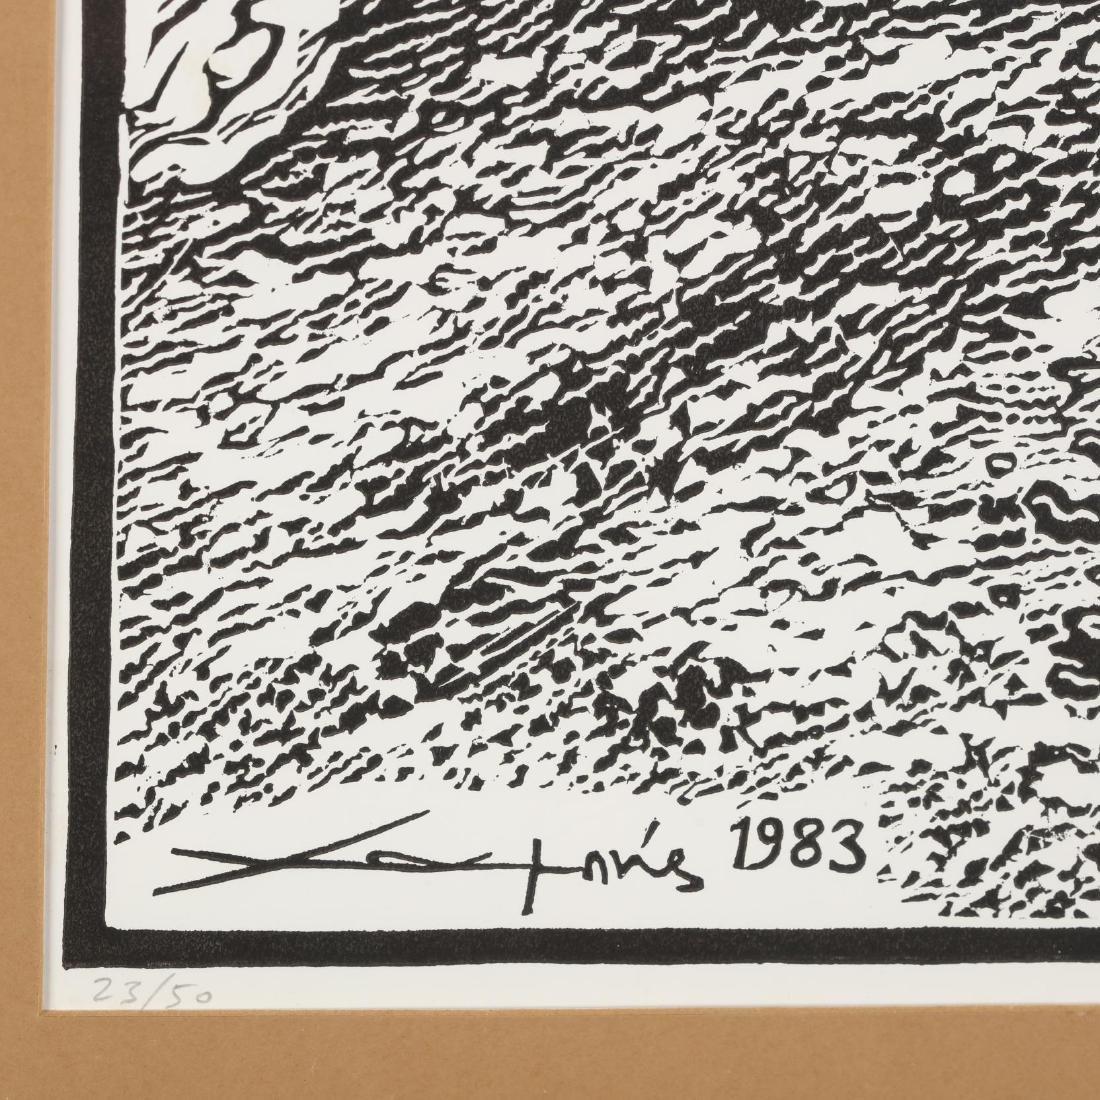 Hambis Tsangaris (Cypriot, b. 1947), Rustic Landscape - 2